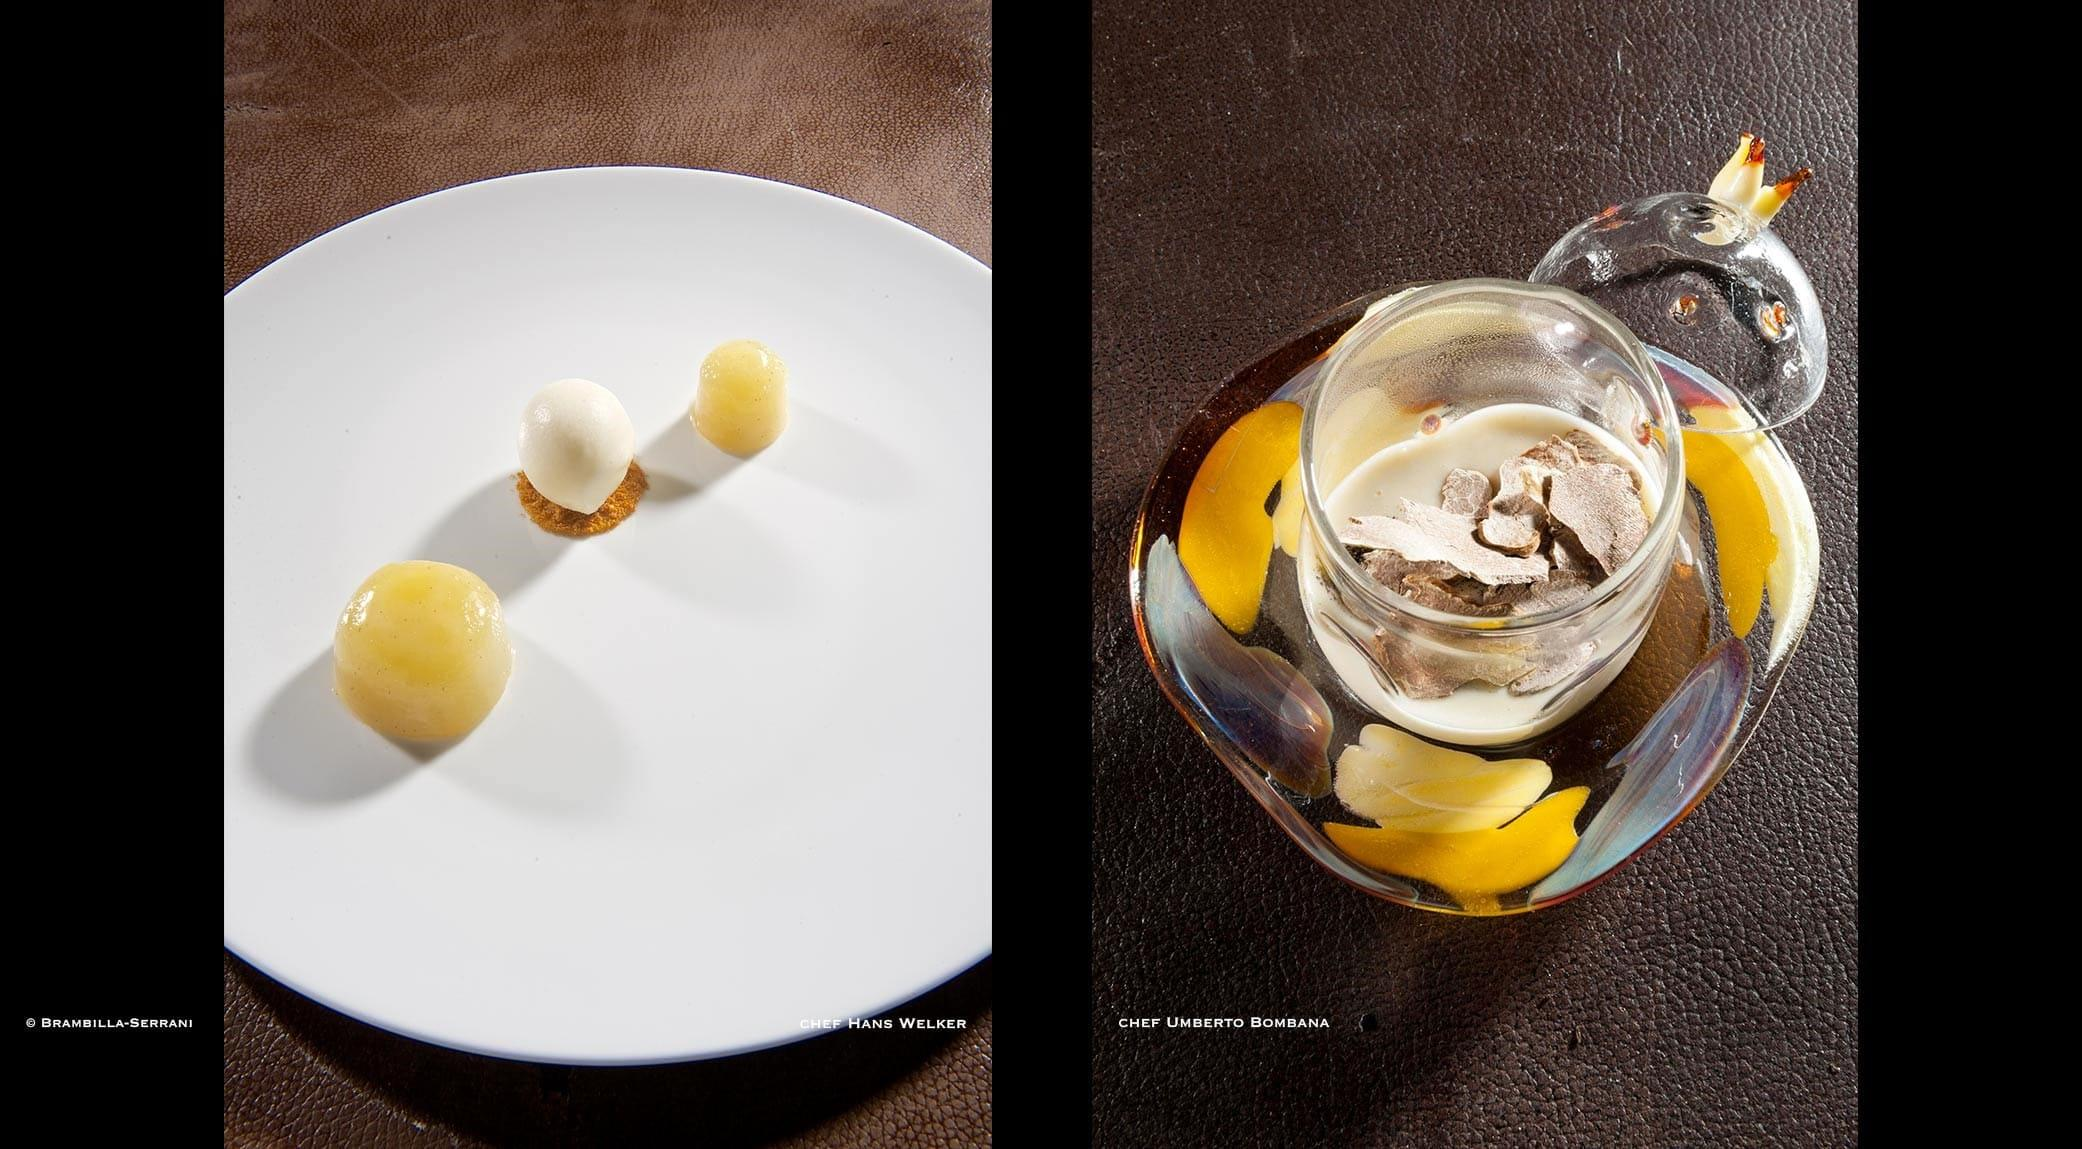 original_05-Hans-Welker-Umberto-Bombana-dish.jpg